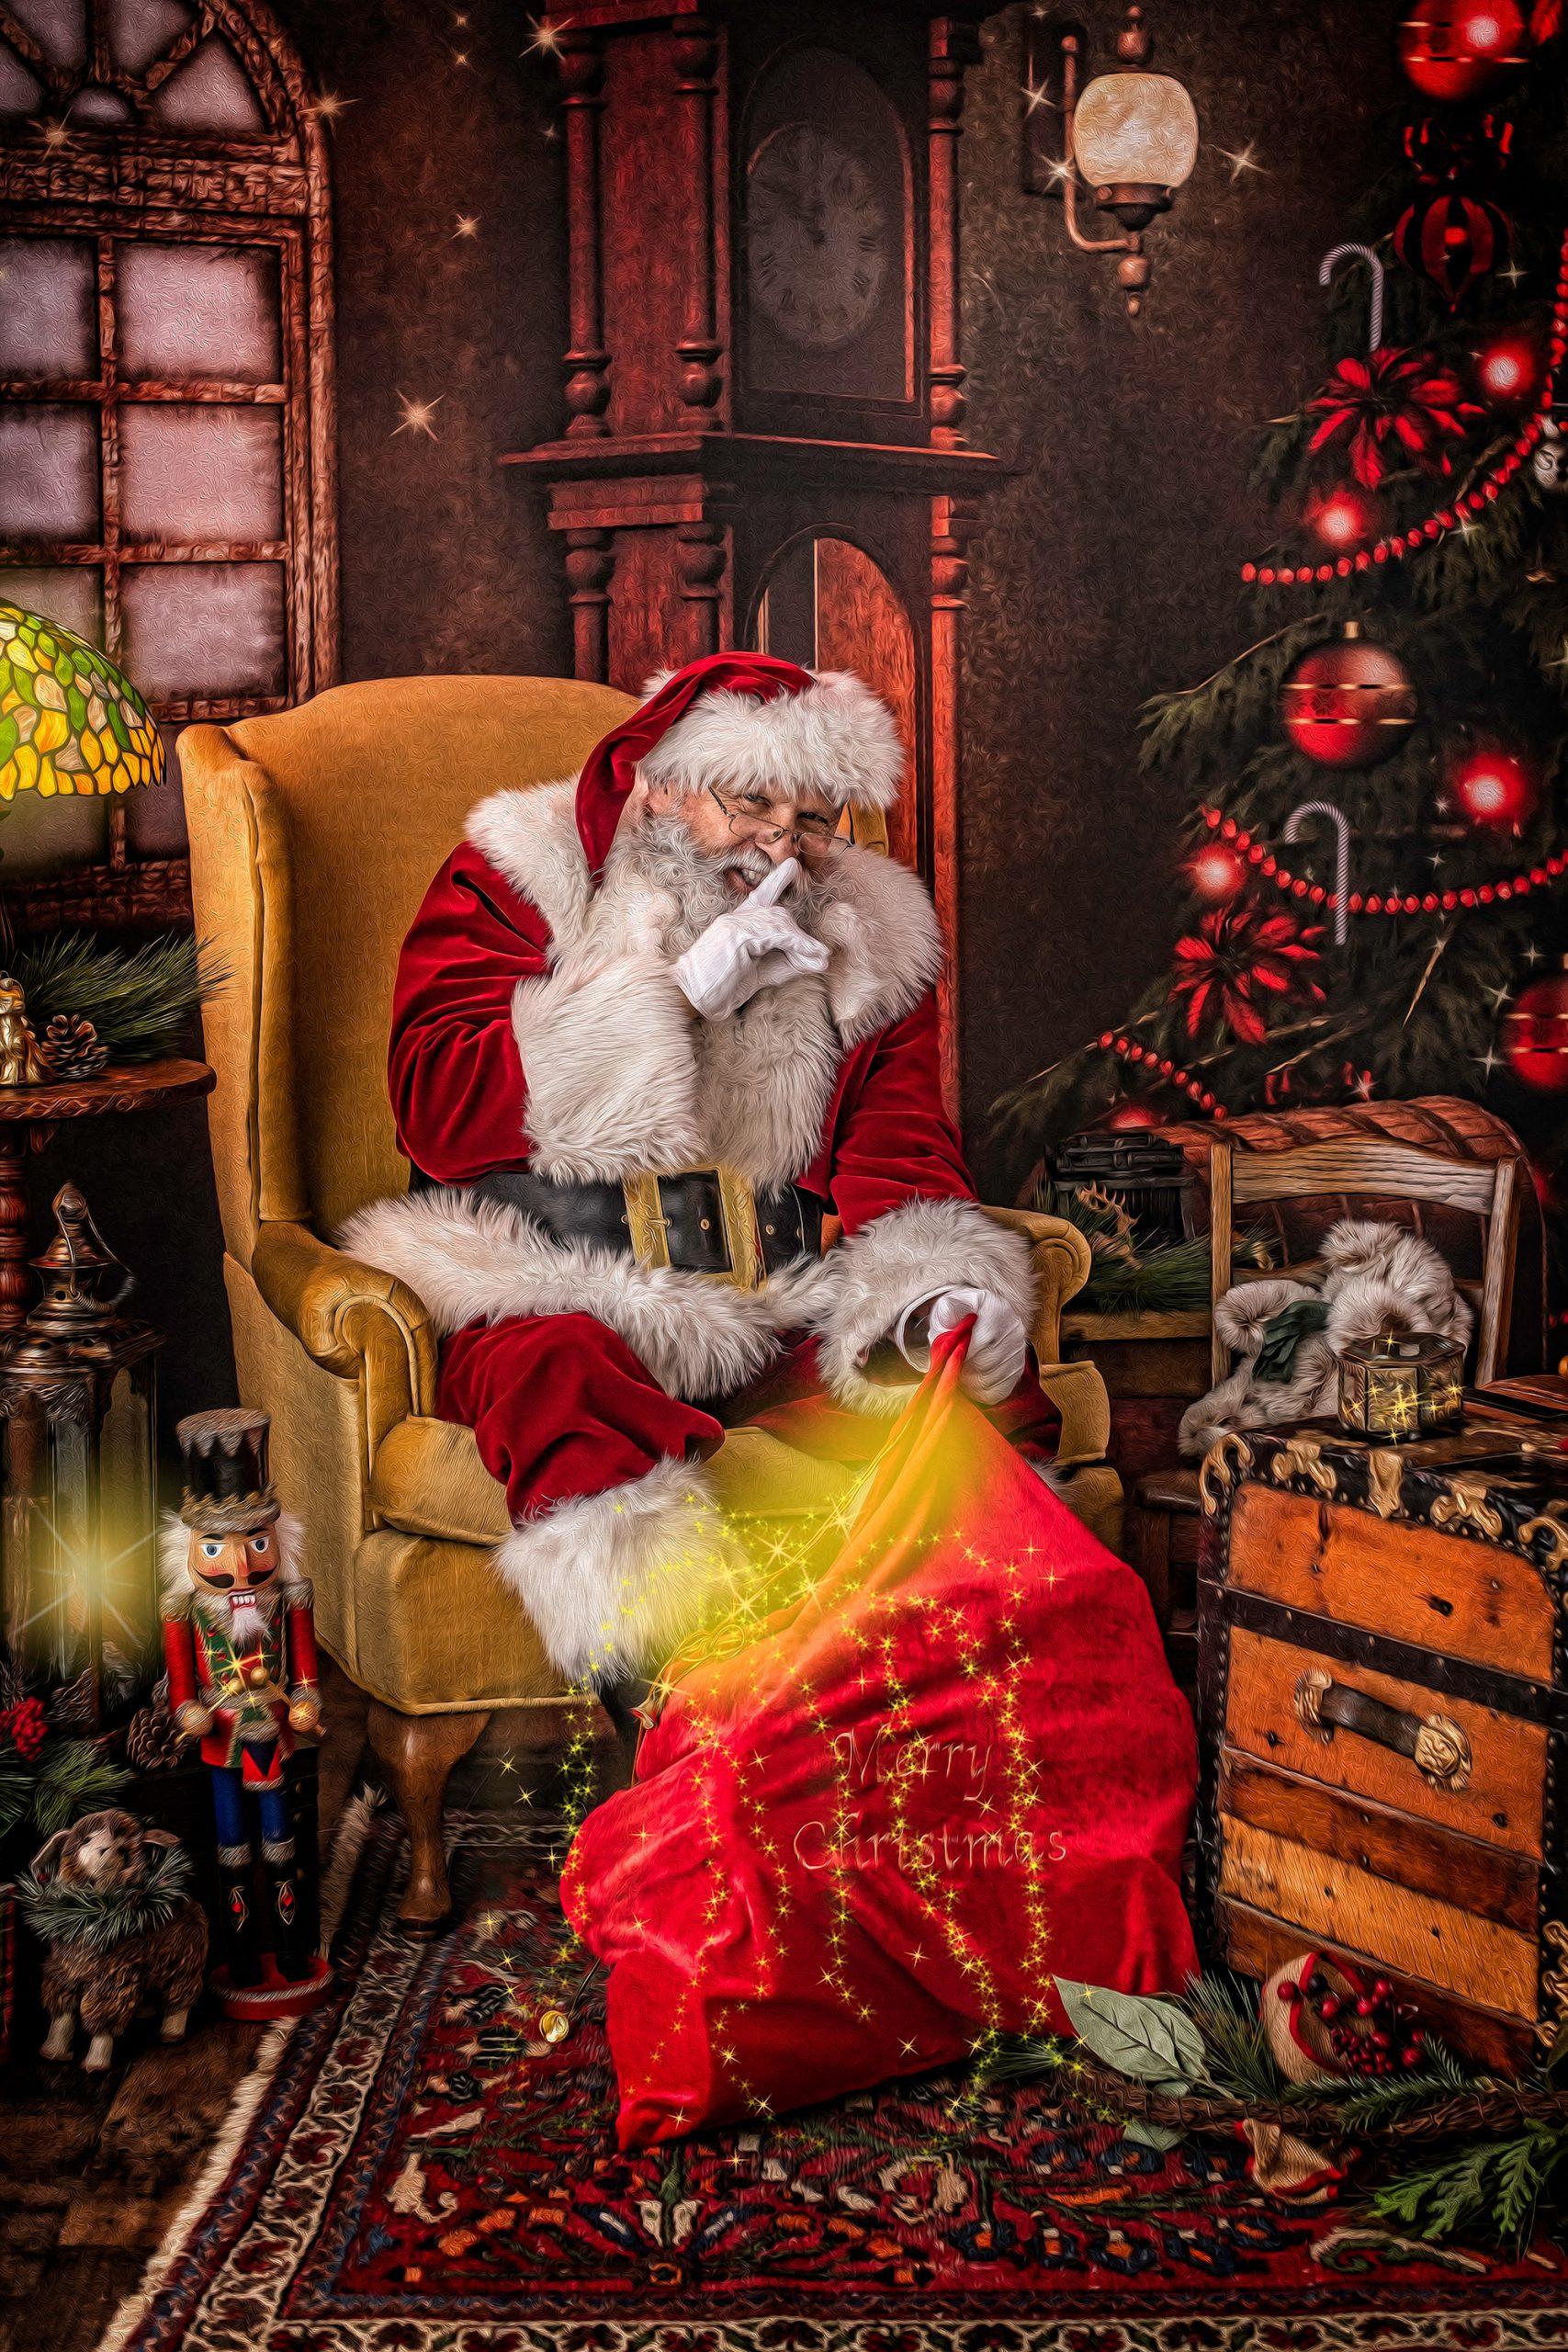 santa sitting in chair boerne and austin texas